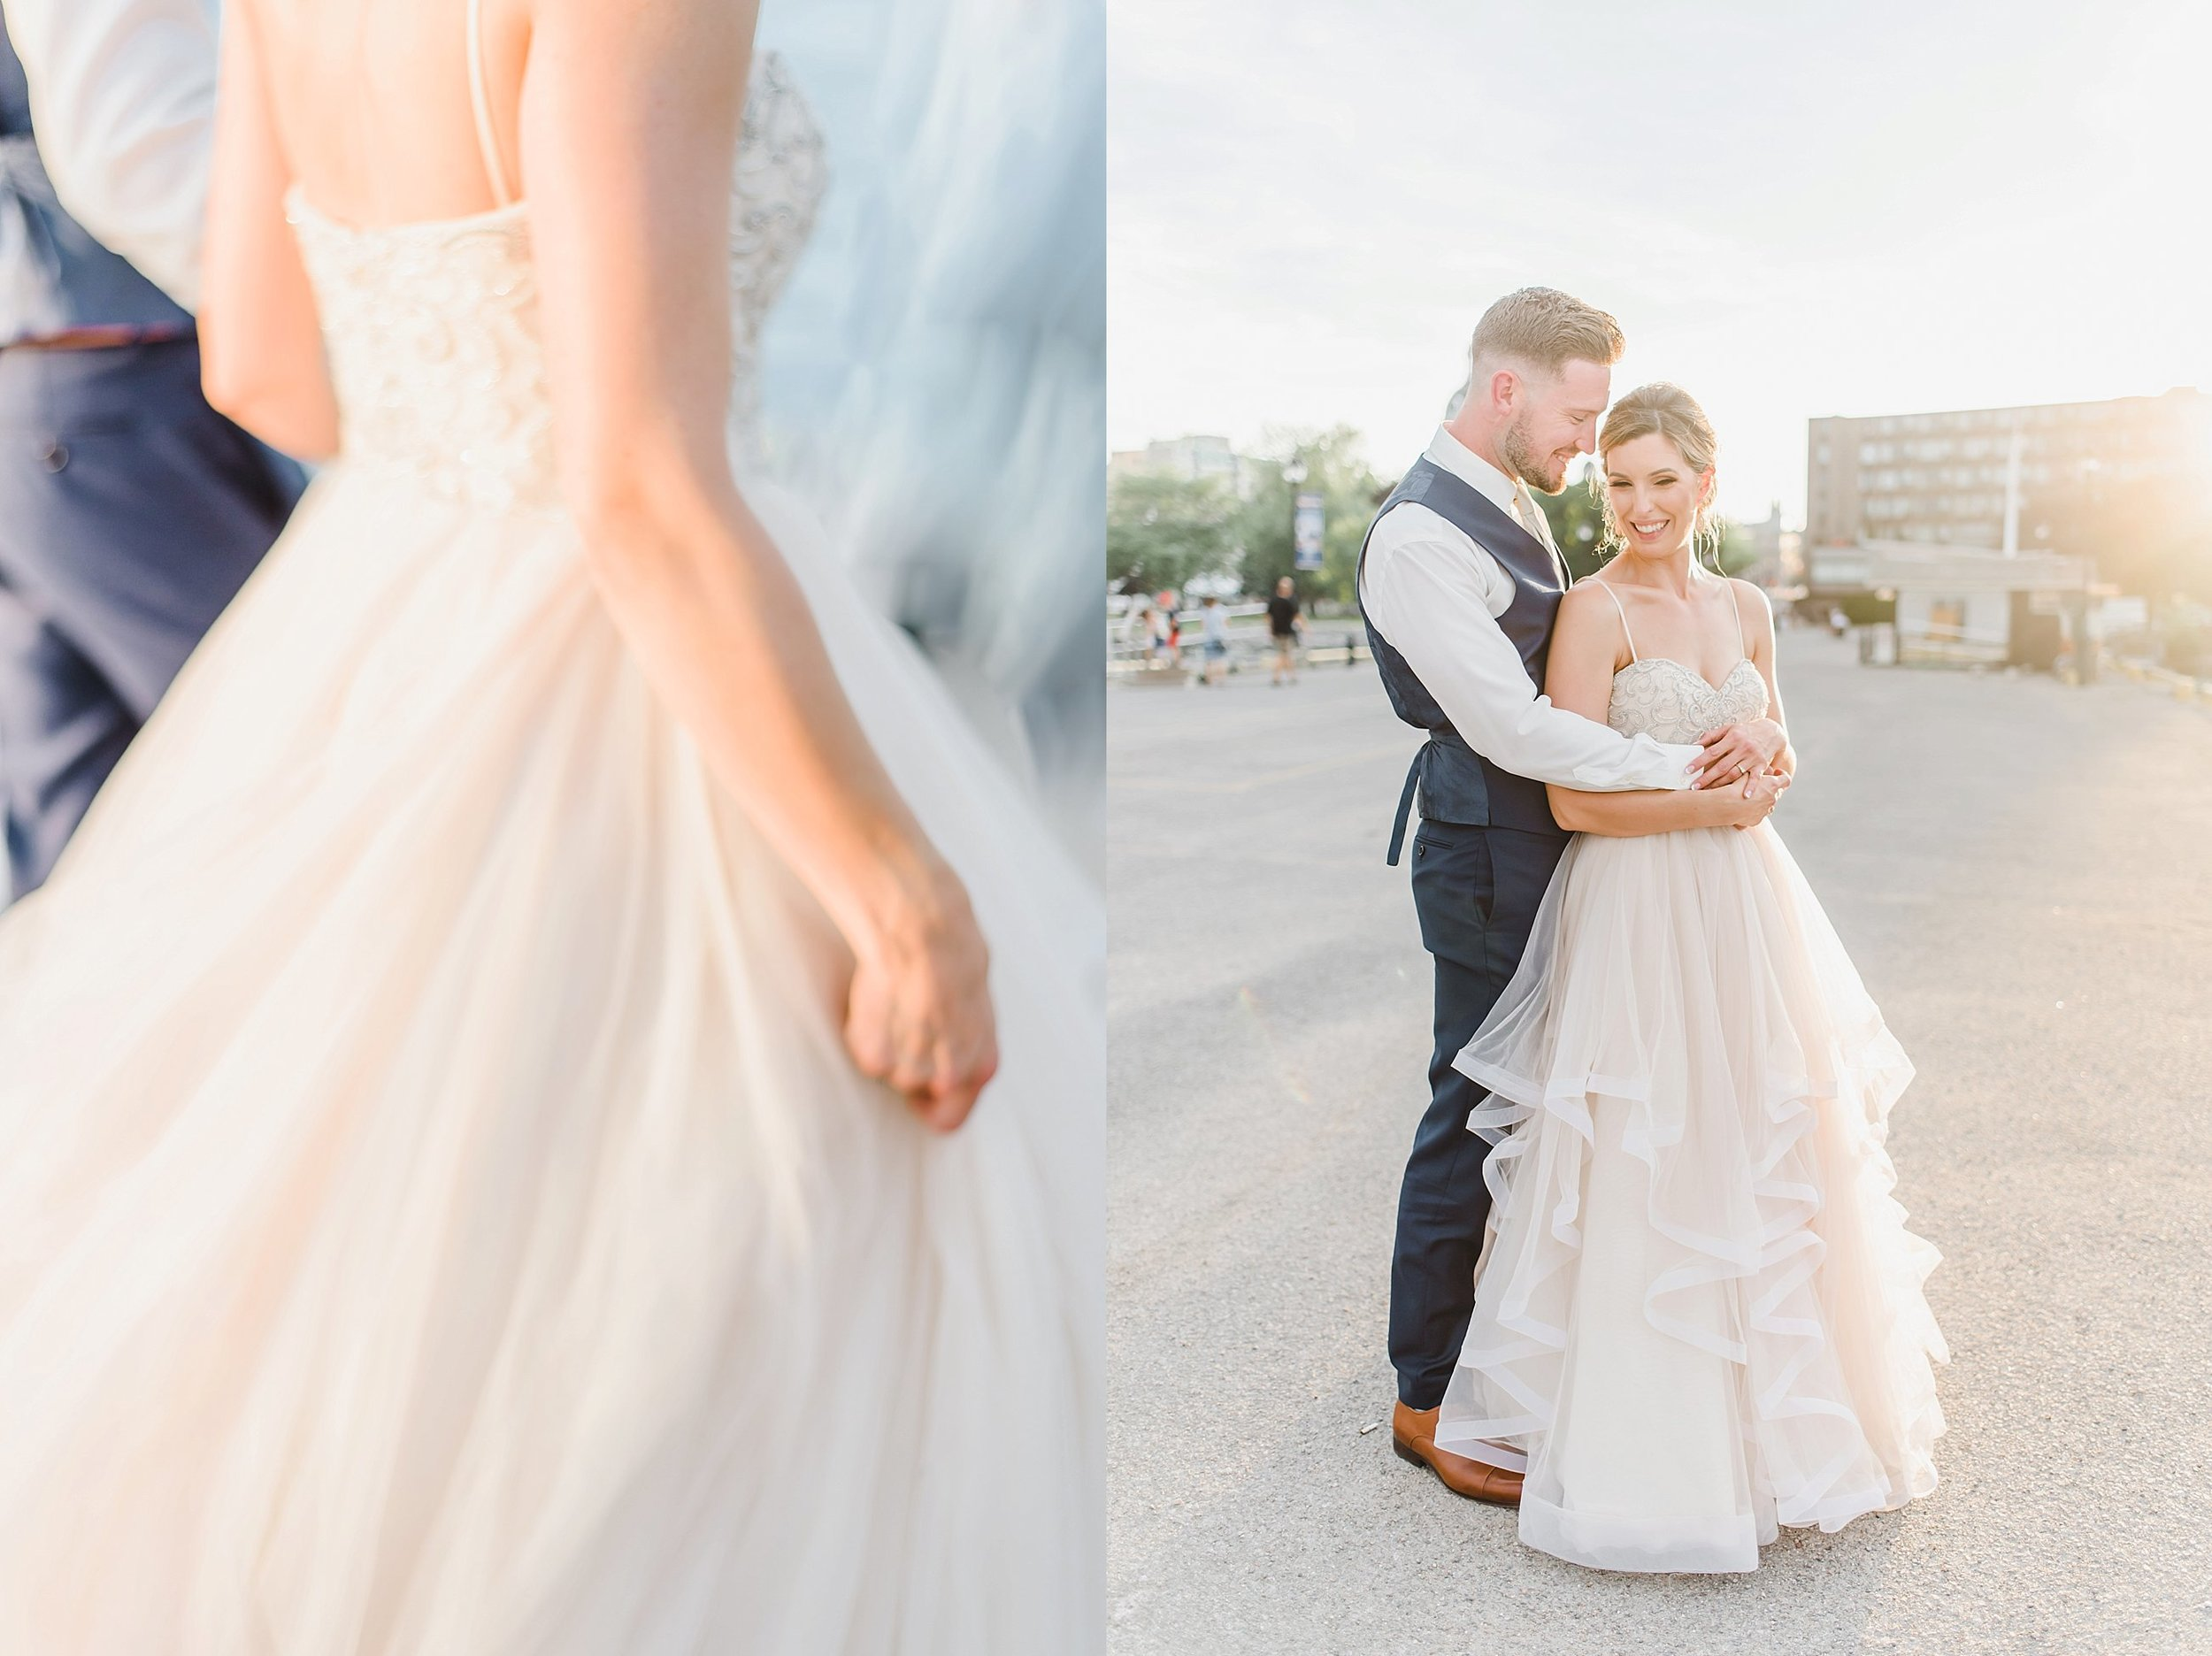 light airy indie fine art ottawa wedding photographer | Ali and Batoul Photography_0235.jpg